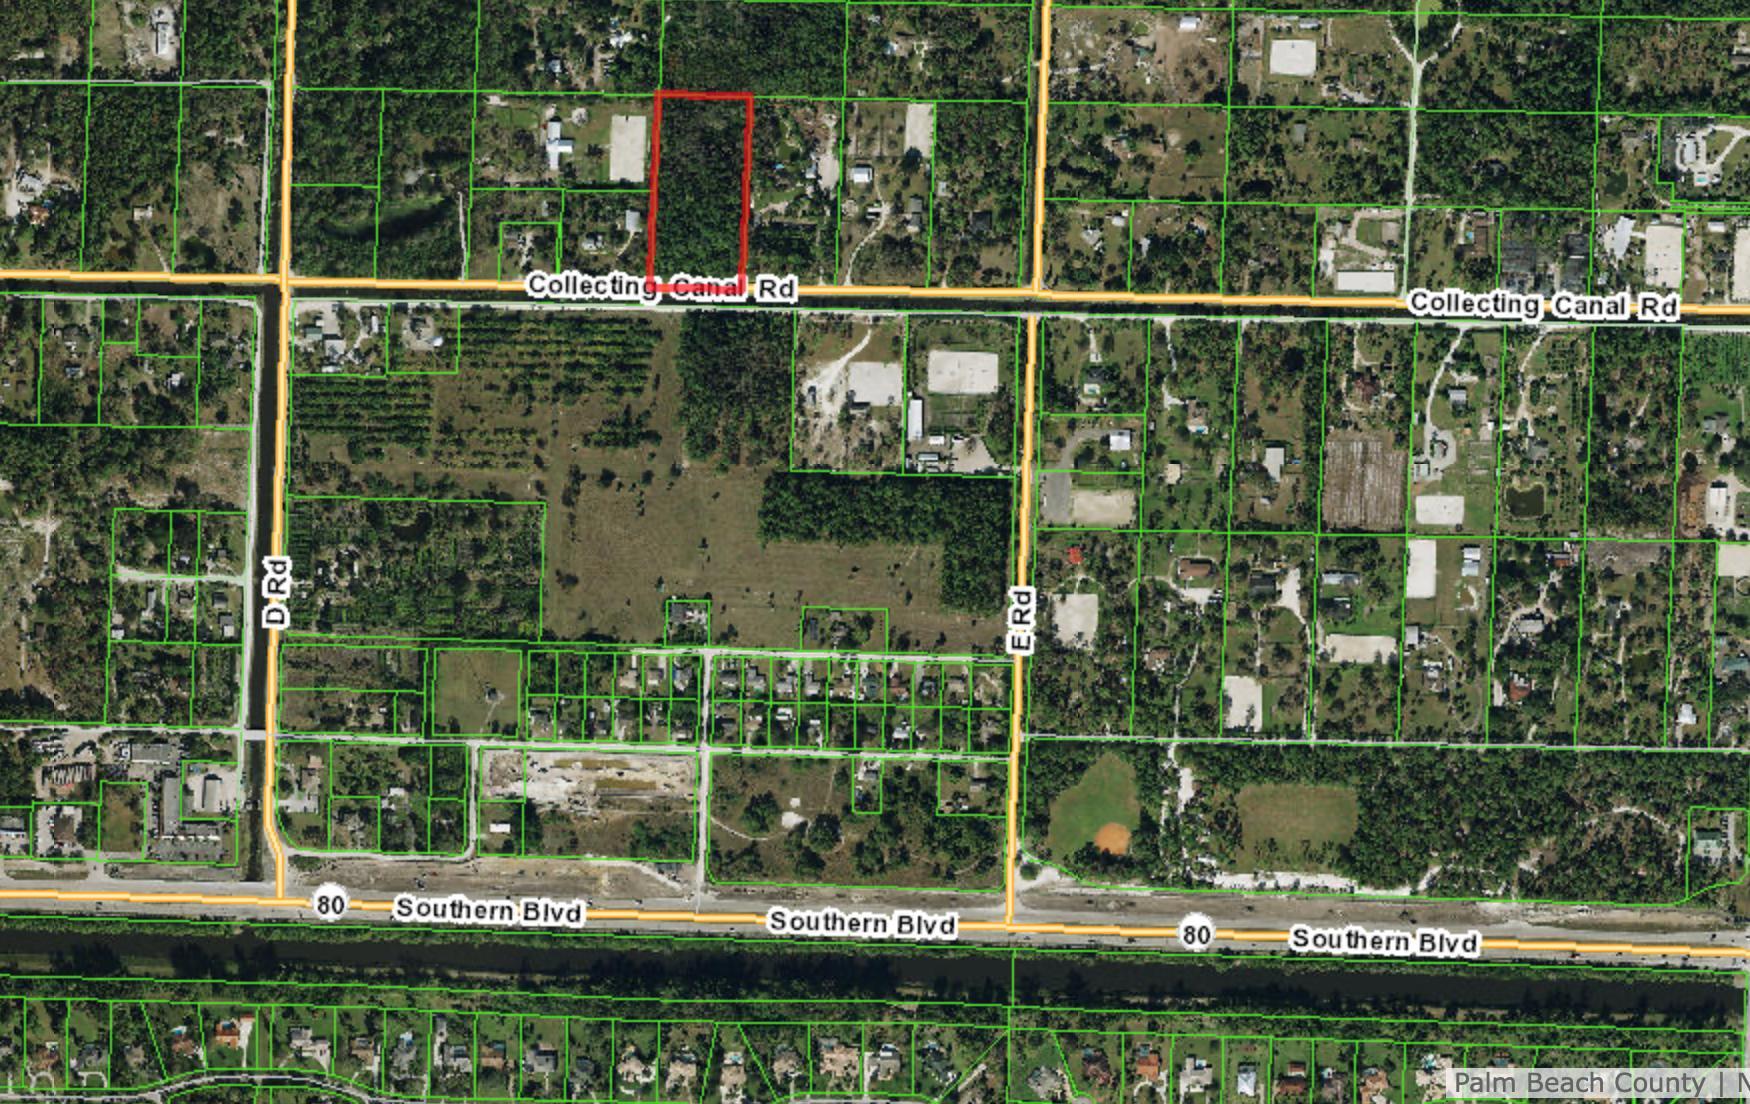 392 F Road Loxahatchee Groves, FL 33470